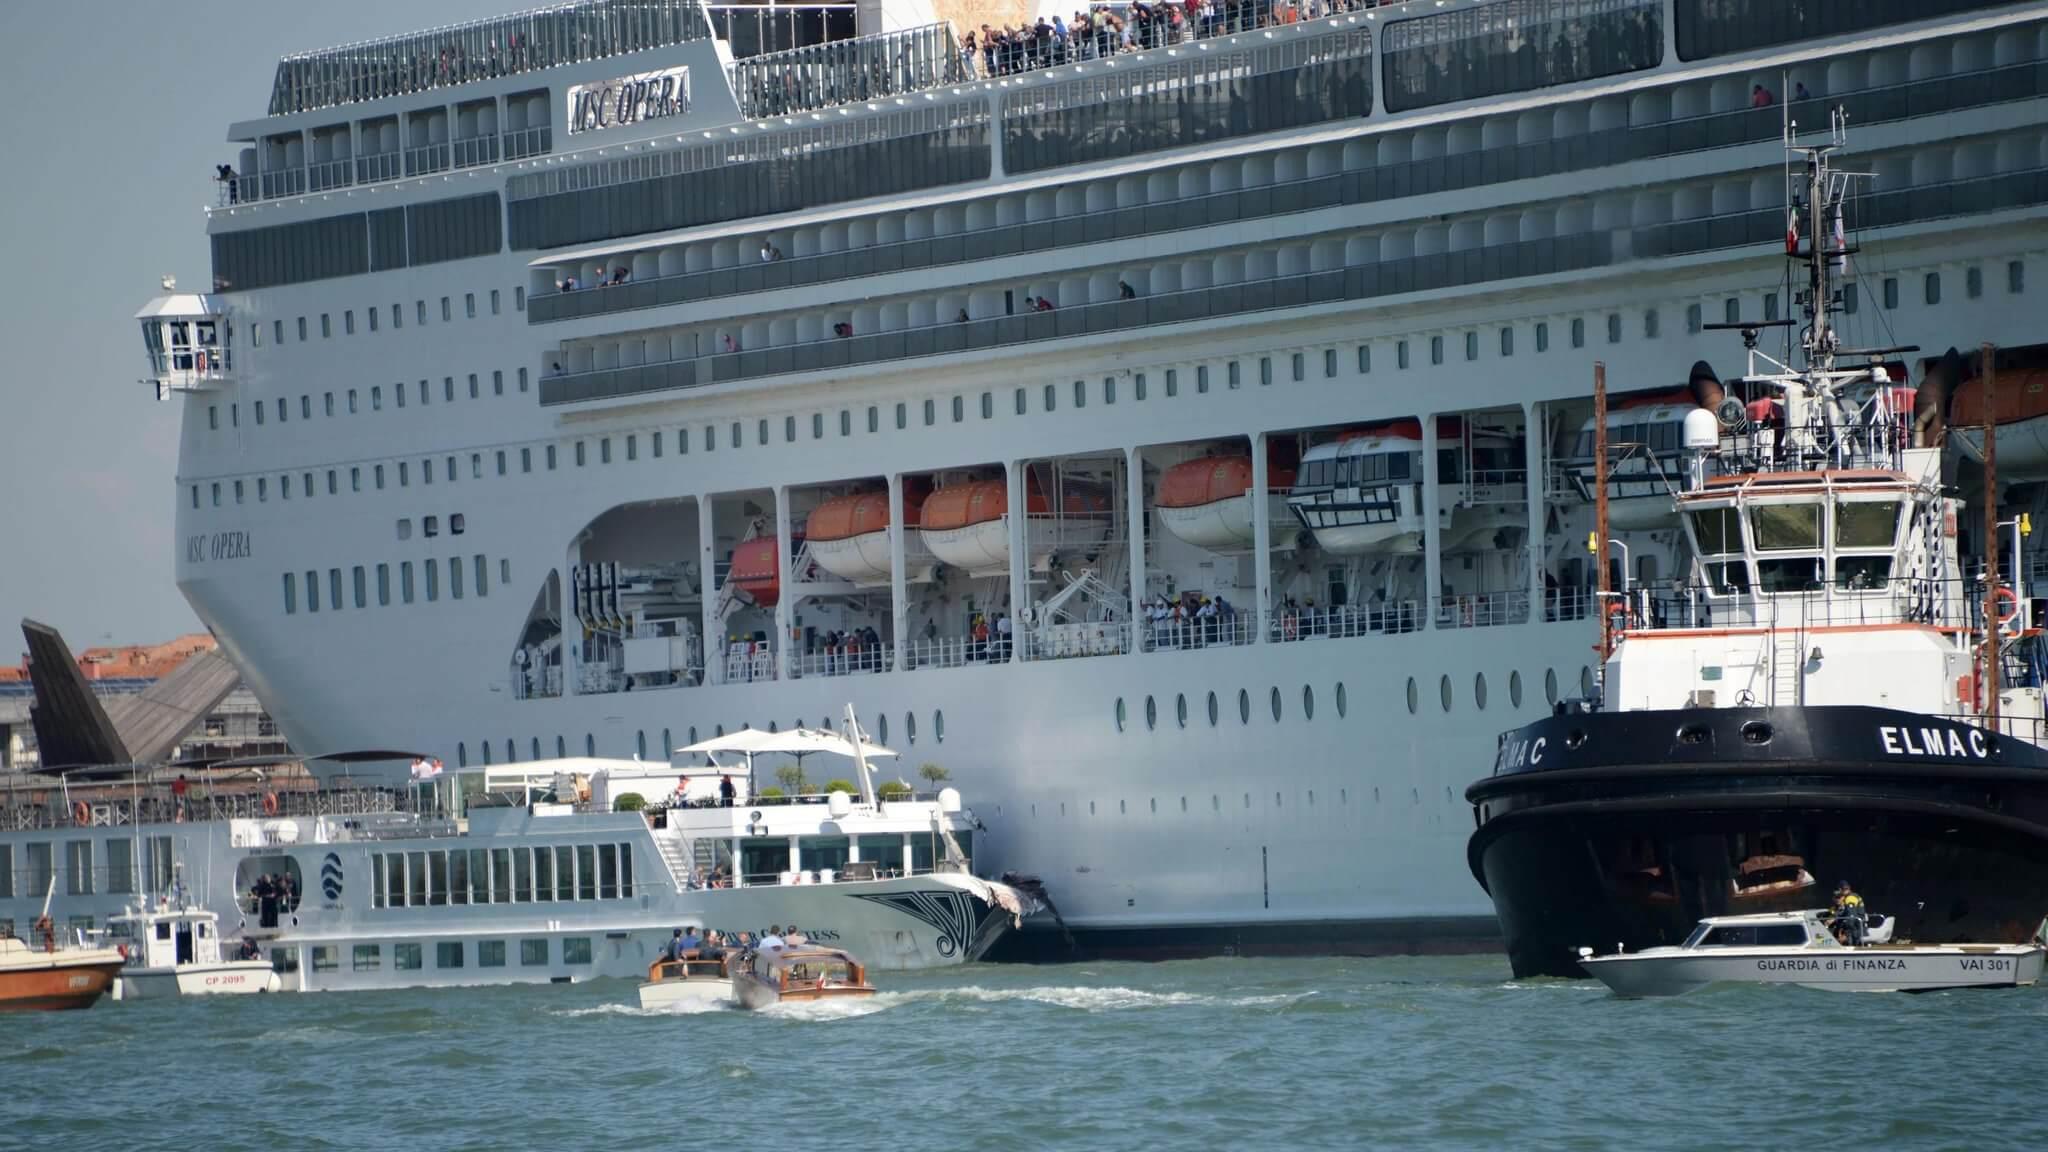 MS Opera Cruise cruise ship slams into wharf in Venice while tourists flee